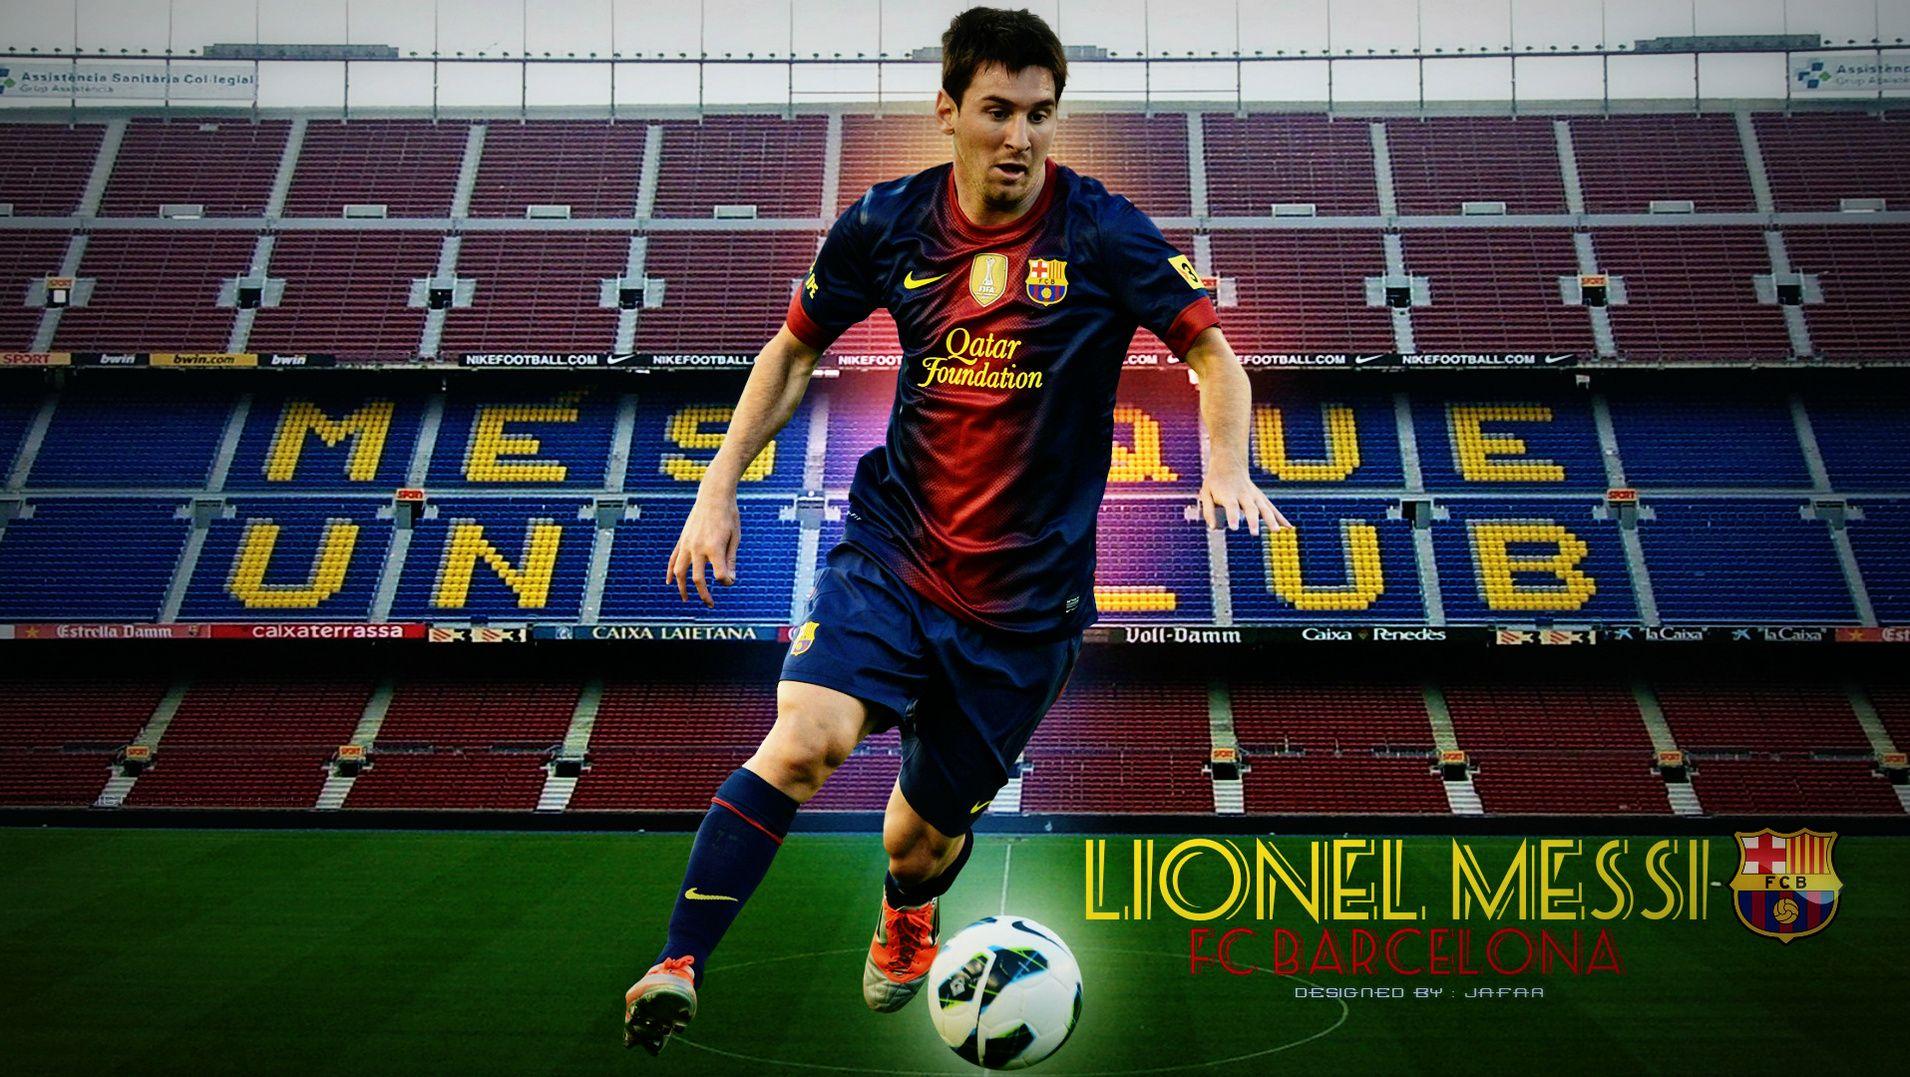 new barcelona lionel messi 2013 full hd wallpaper | messi